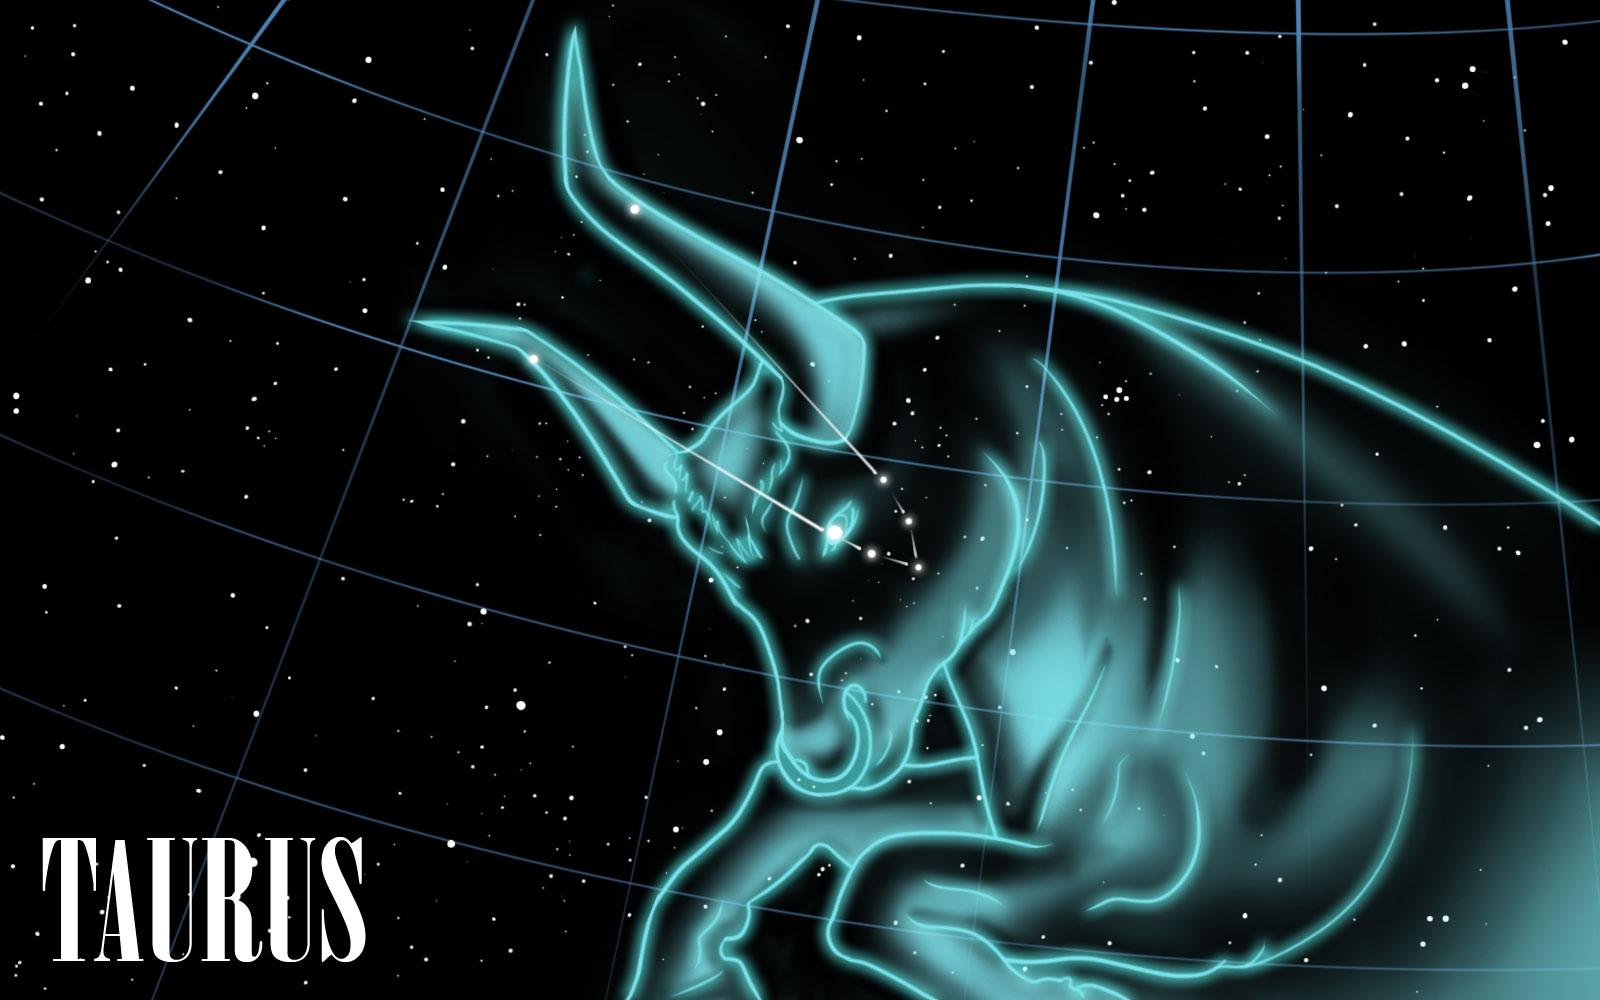 Virgo zodiac horoscope hd wallpapers one hd wallpaper pictures - Mattdemino November 2010